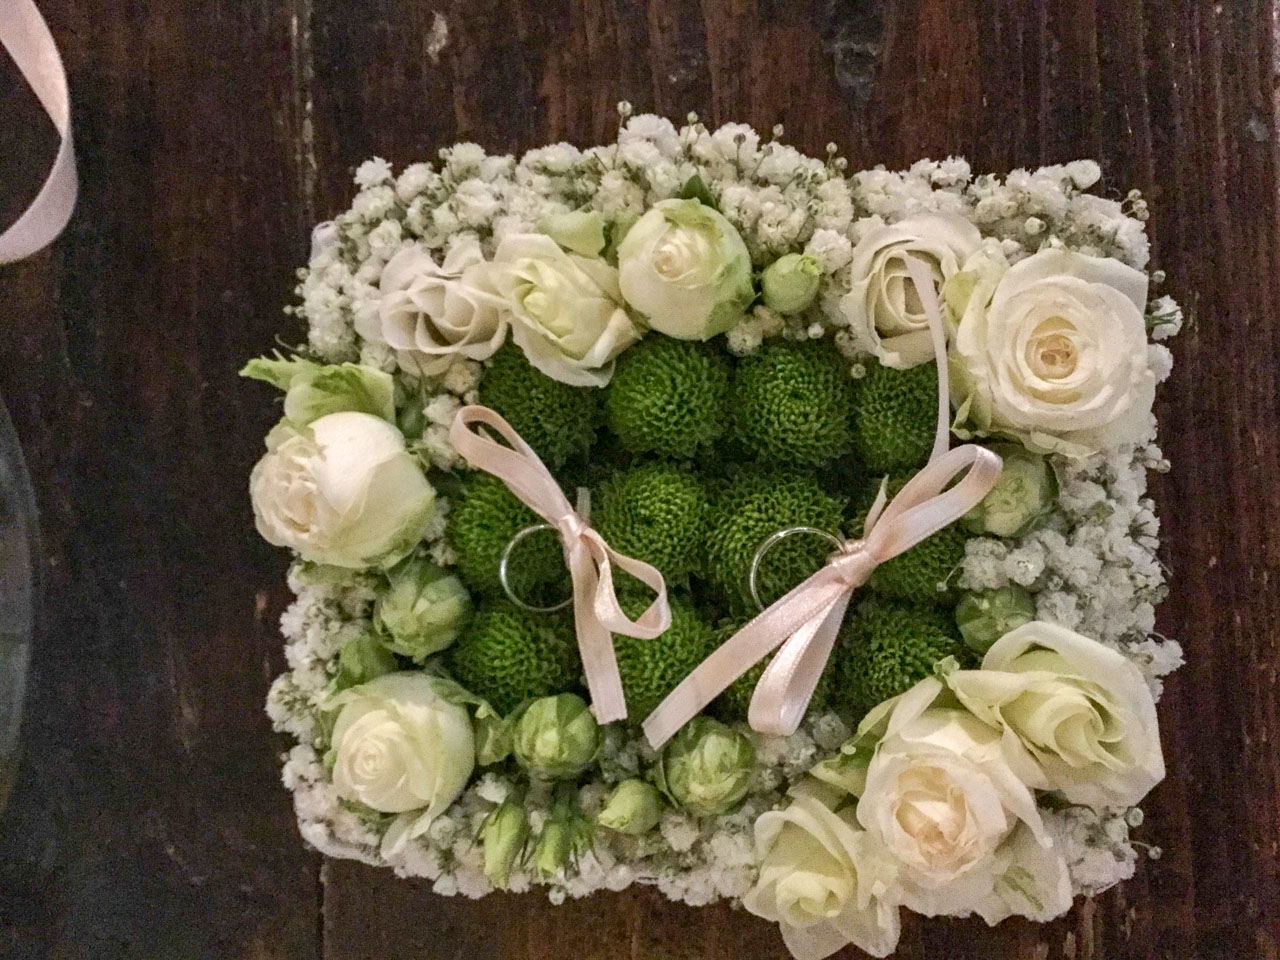 carmen-gambarota-floradesign-bouquet-1